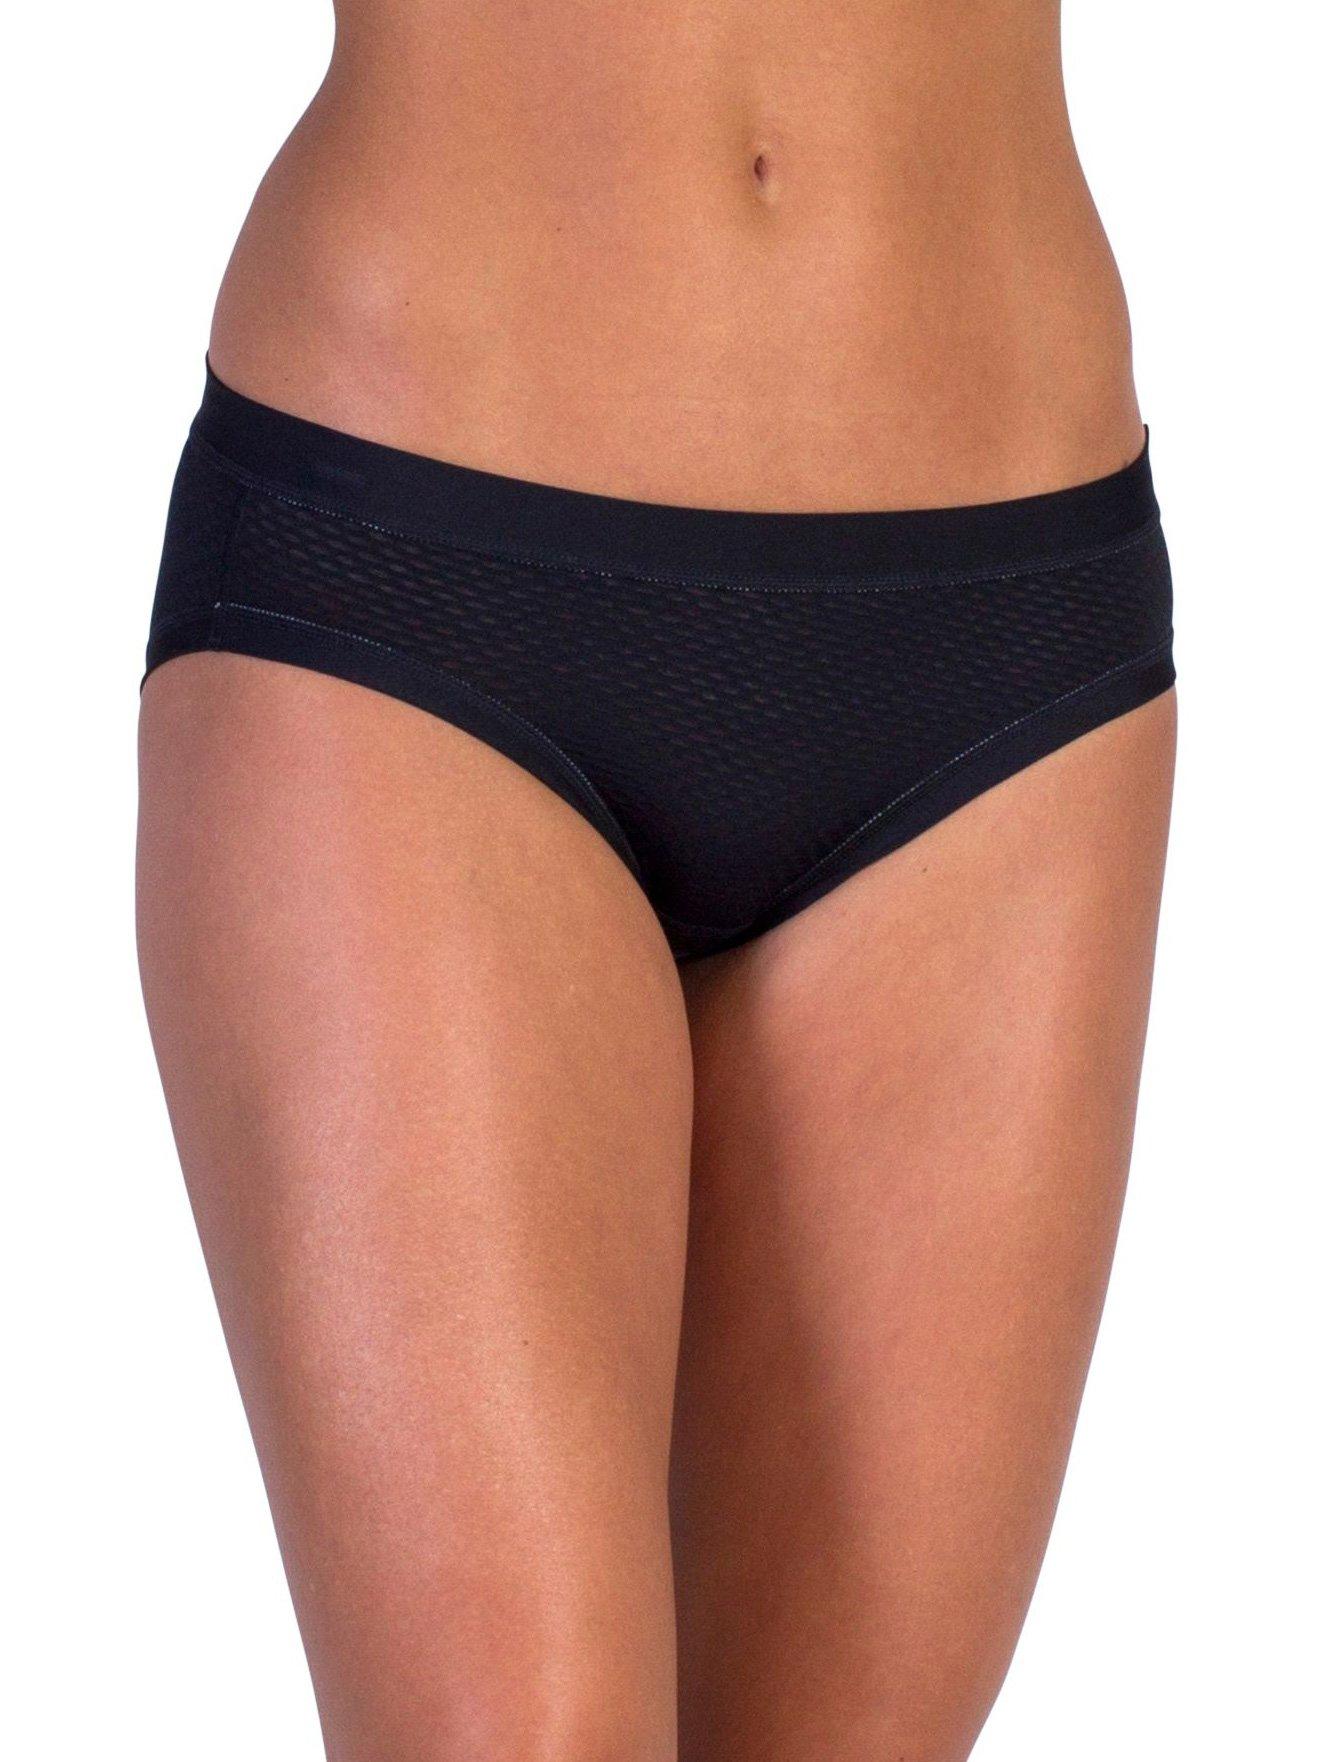 ExOfficio Give-N-Go Sport Mesh Bikini Brief (L - Black)